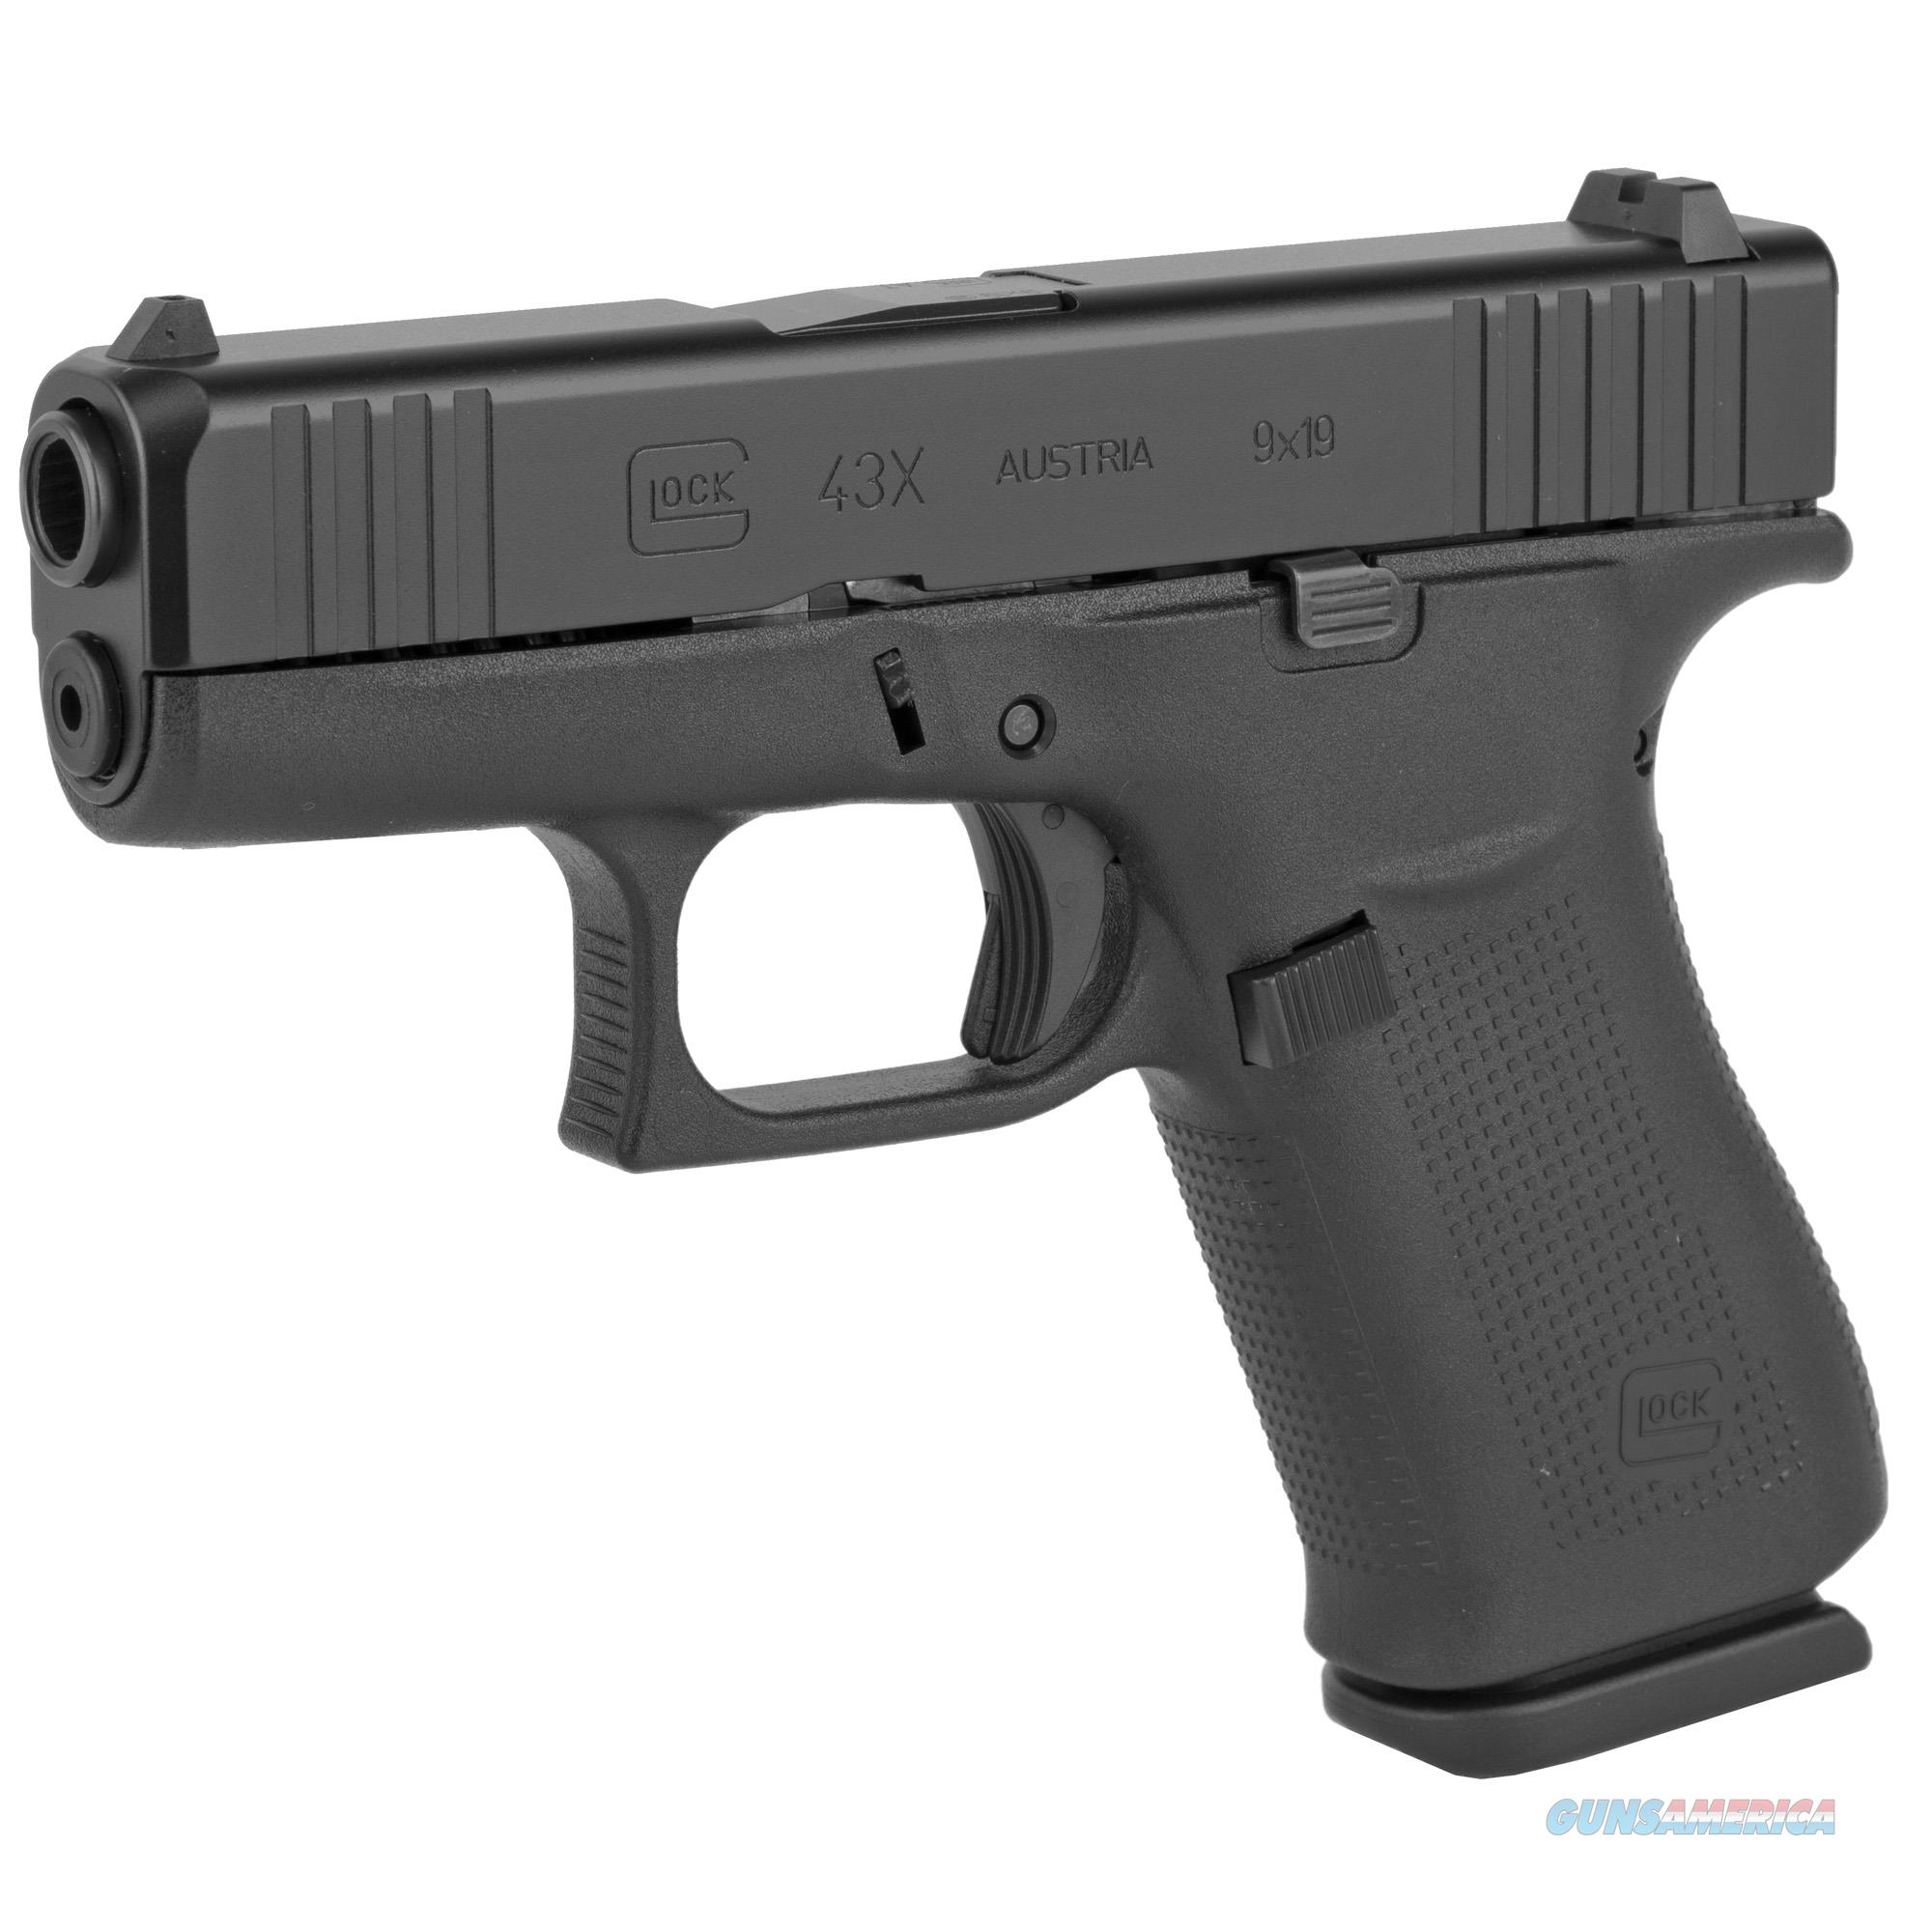 "Glock G43X 9mm 3.41"" 10+1 - New in Case!  Guns > Pistols > Glock Pistols > 43/43X"